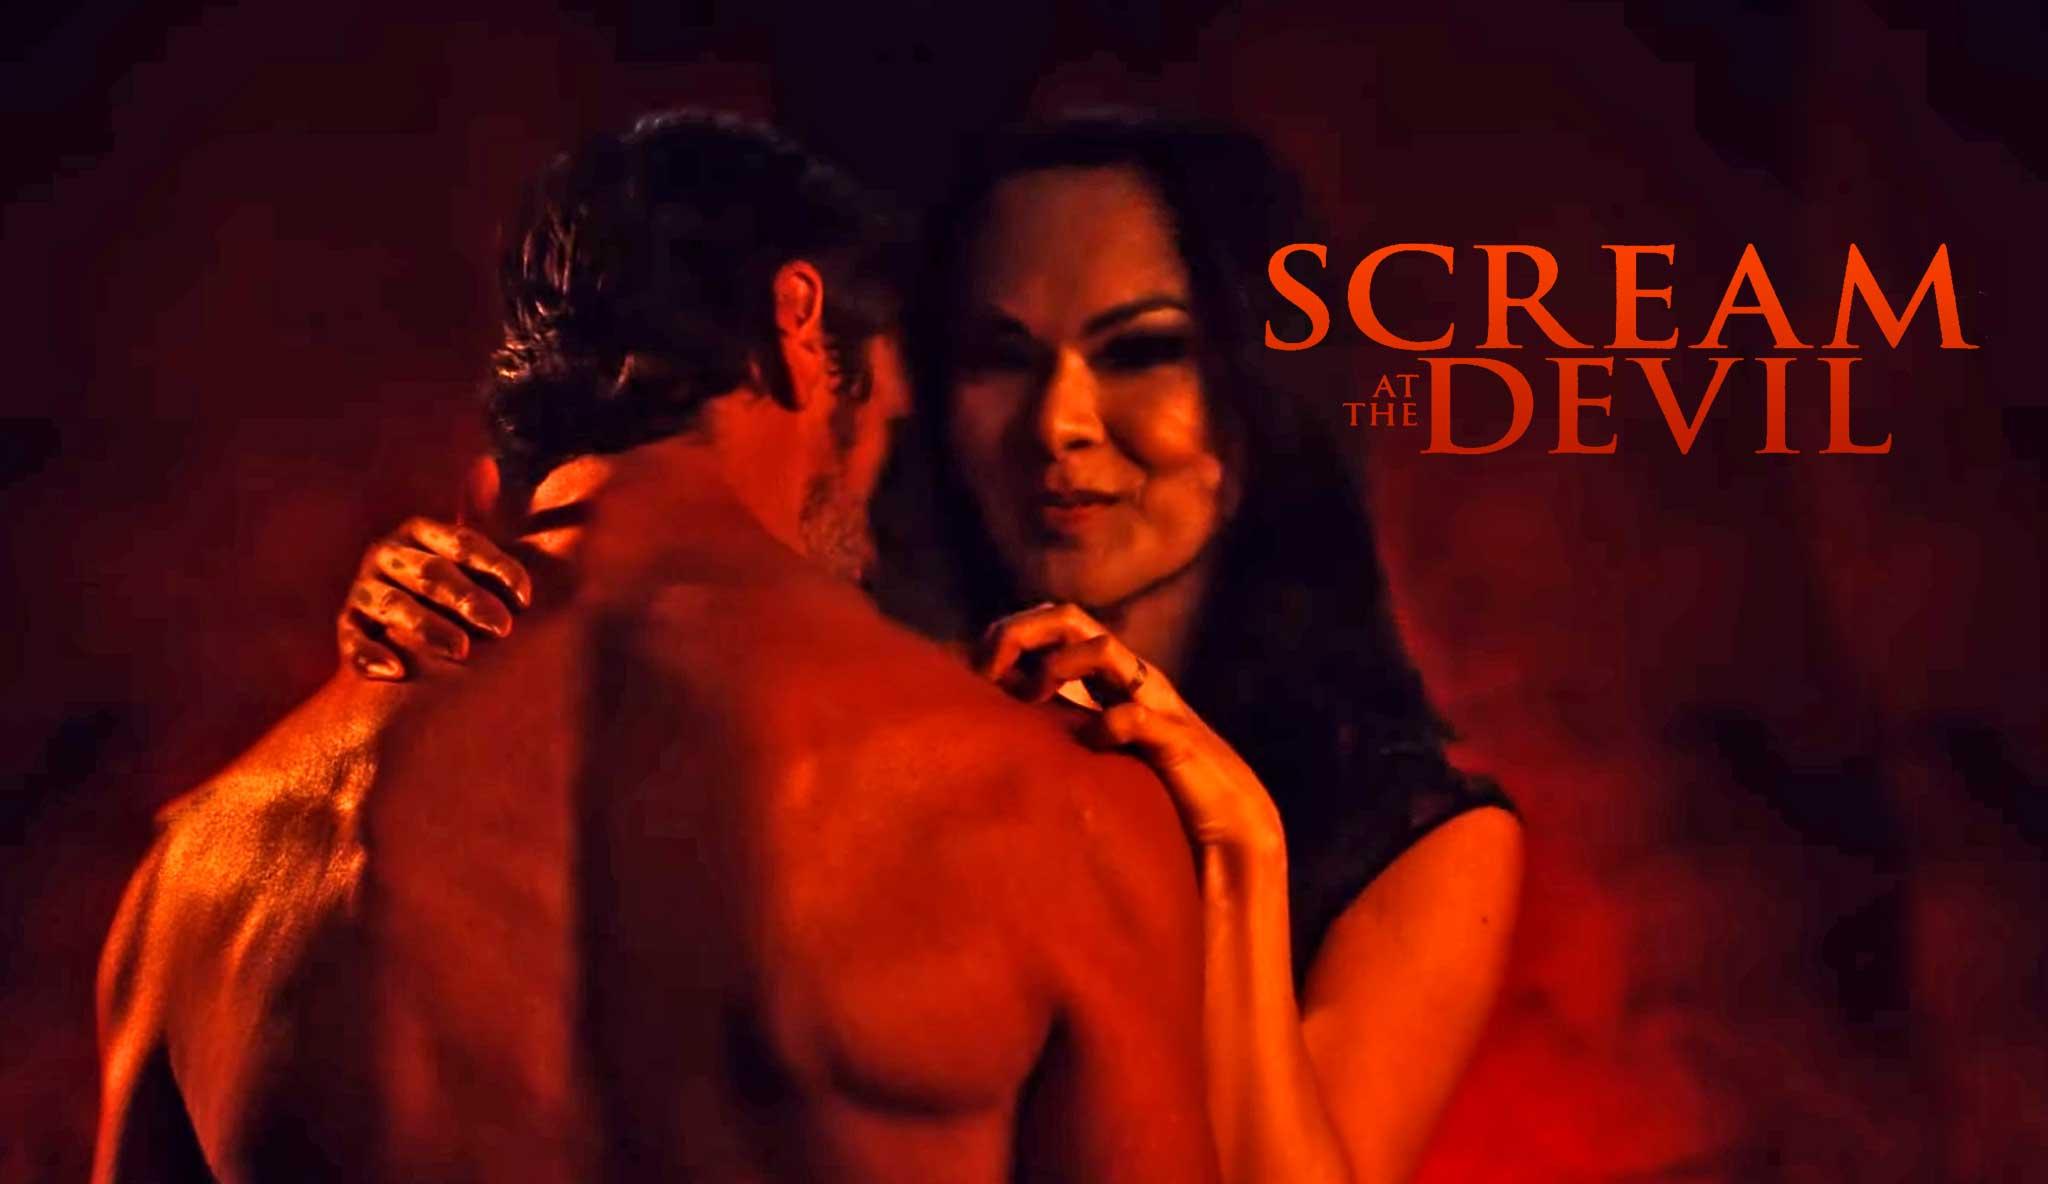 scream-at-the-devil\header.jpg